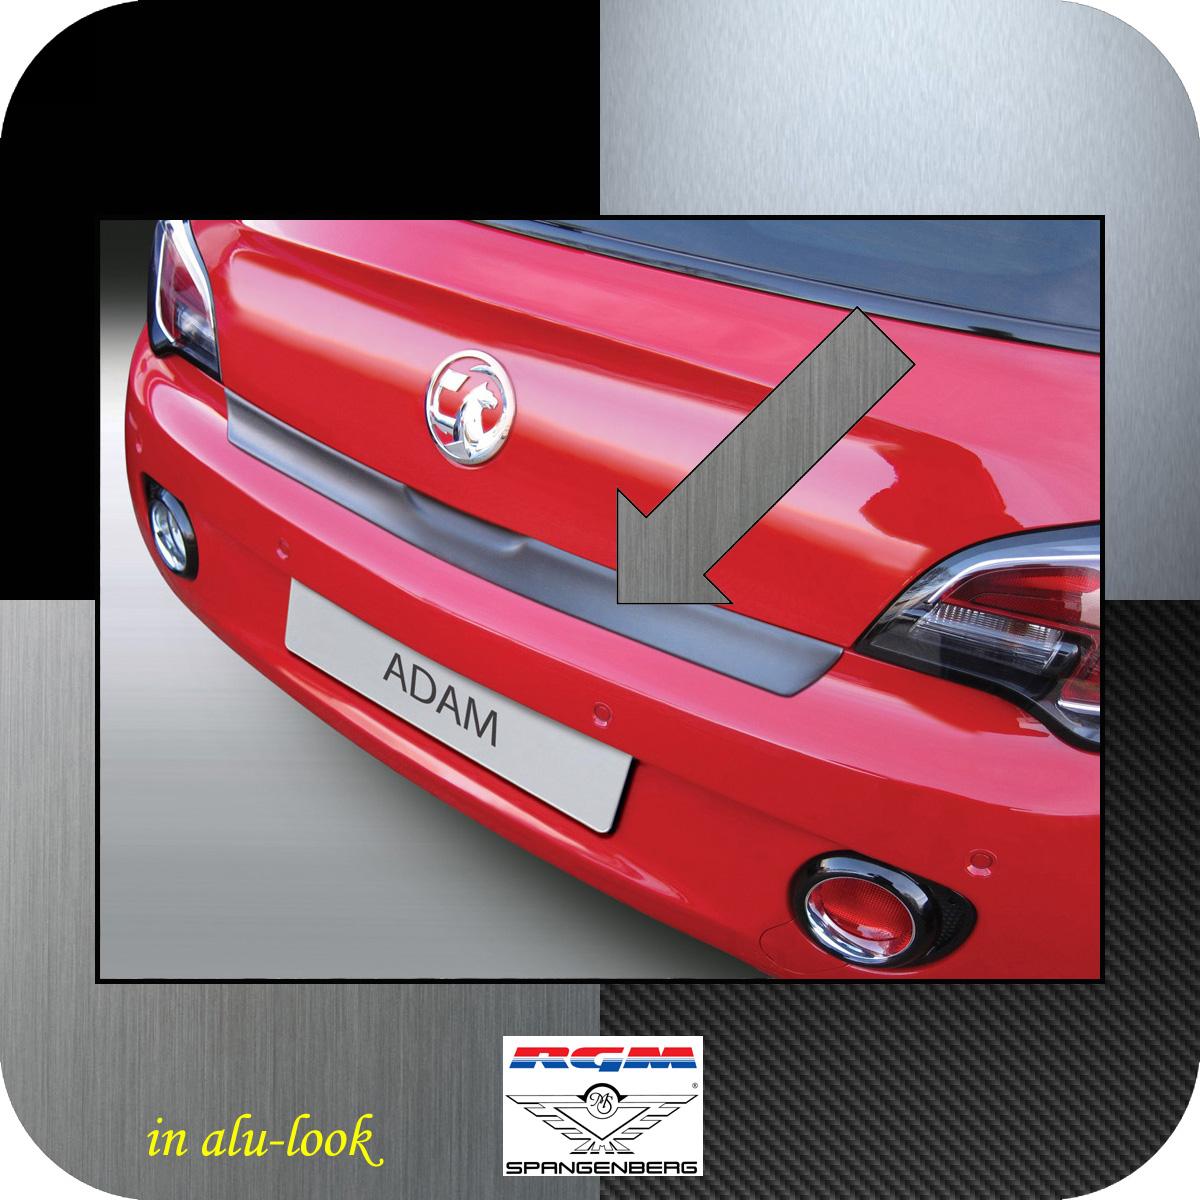 Ladekantenschutz Alu-Look Opel Adam Schrägheck 3-Türer ab Bj 2012- 3504884